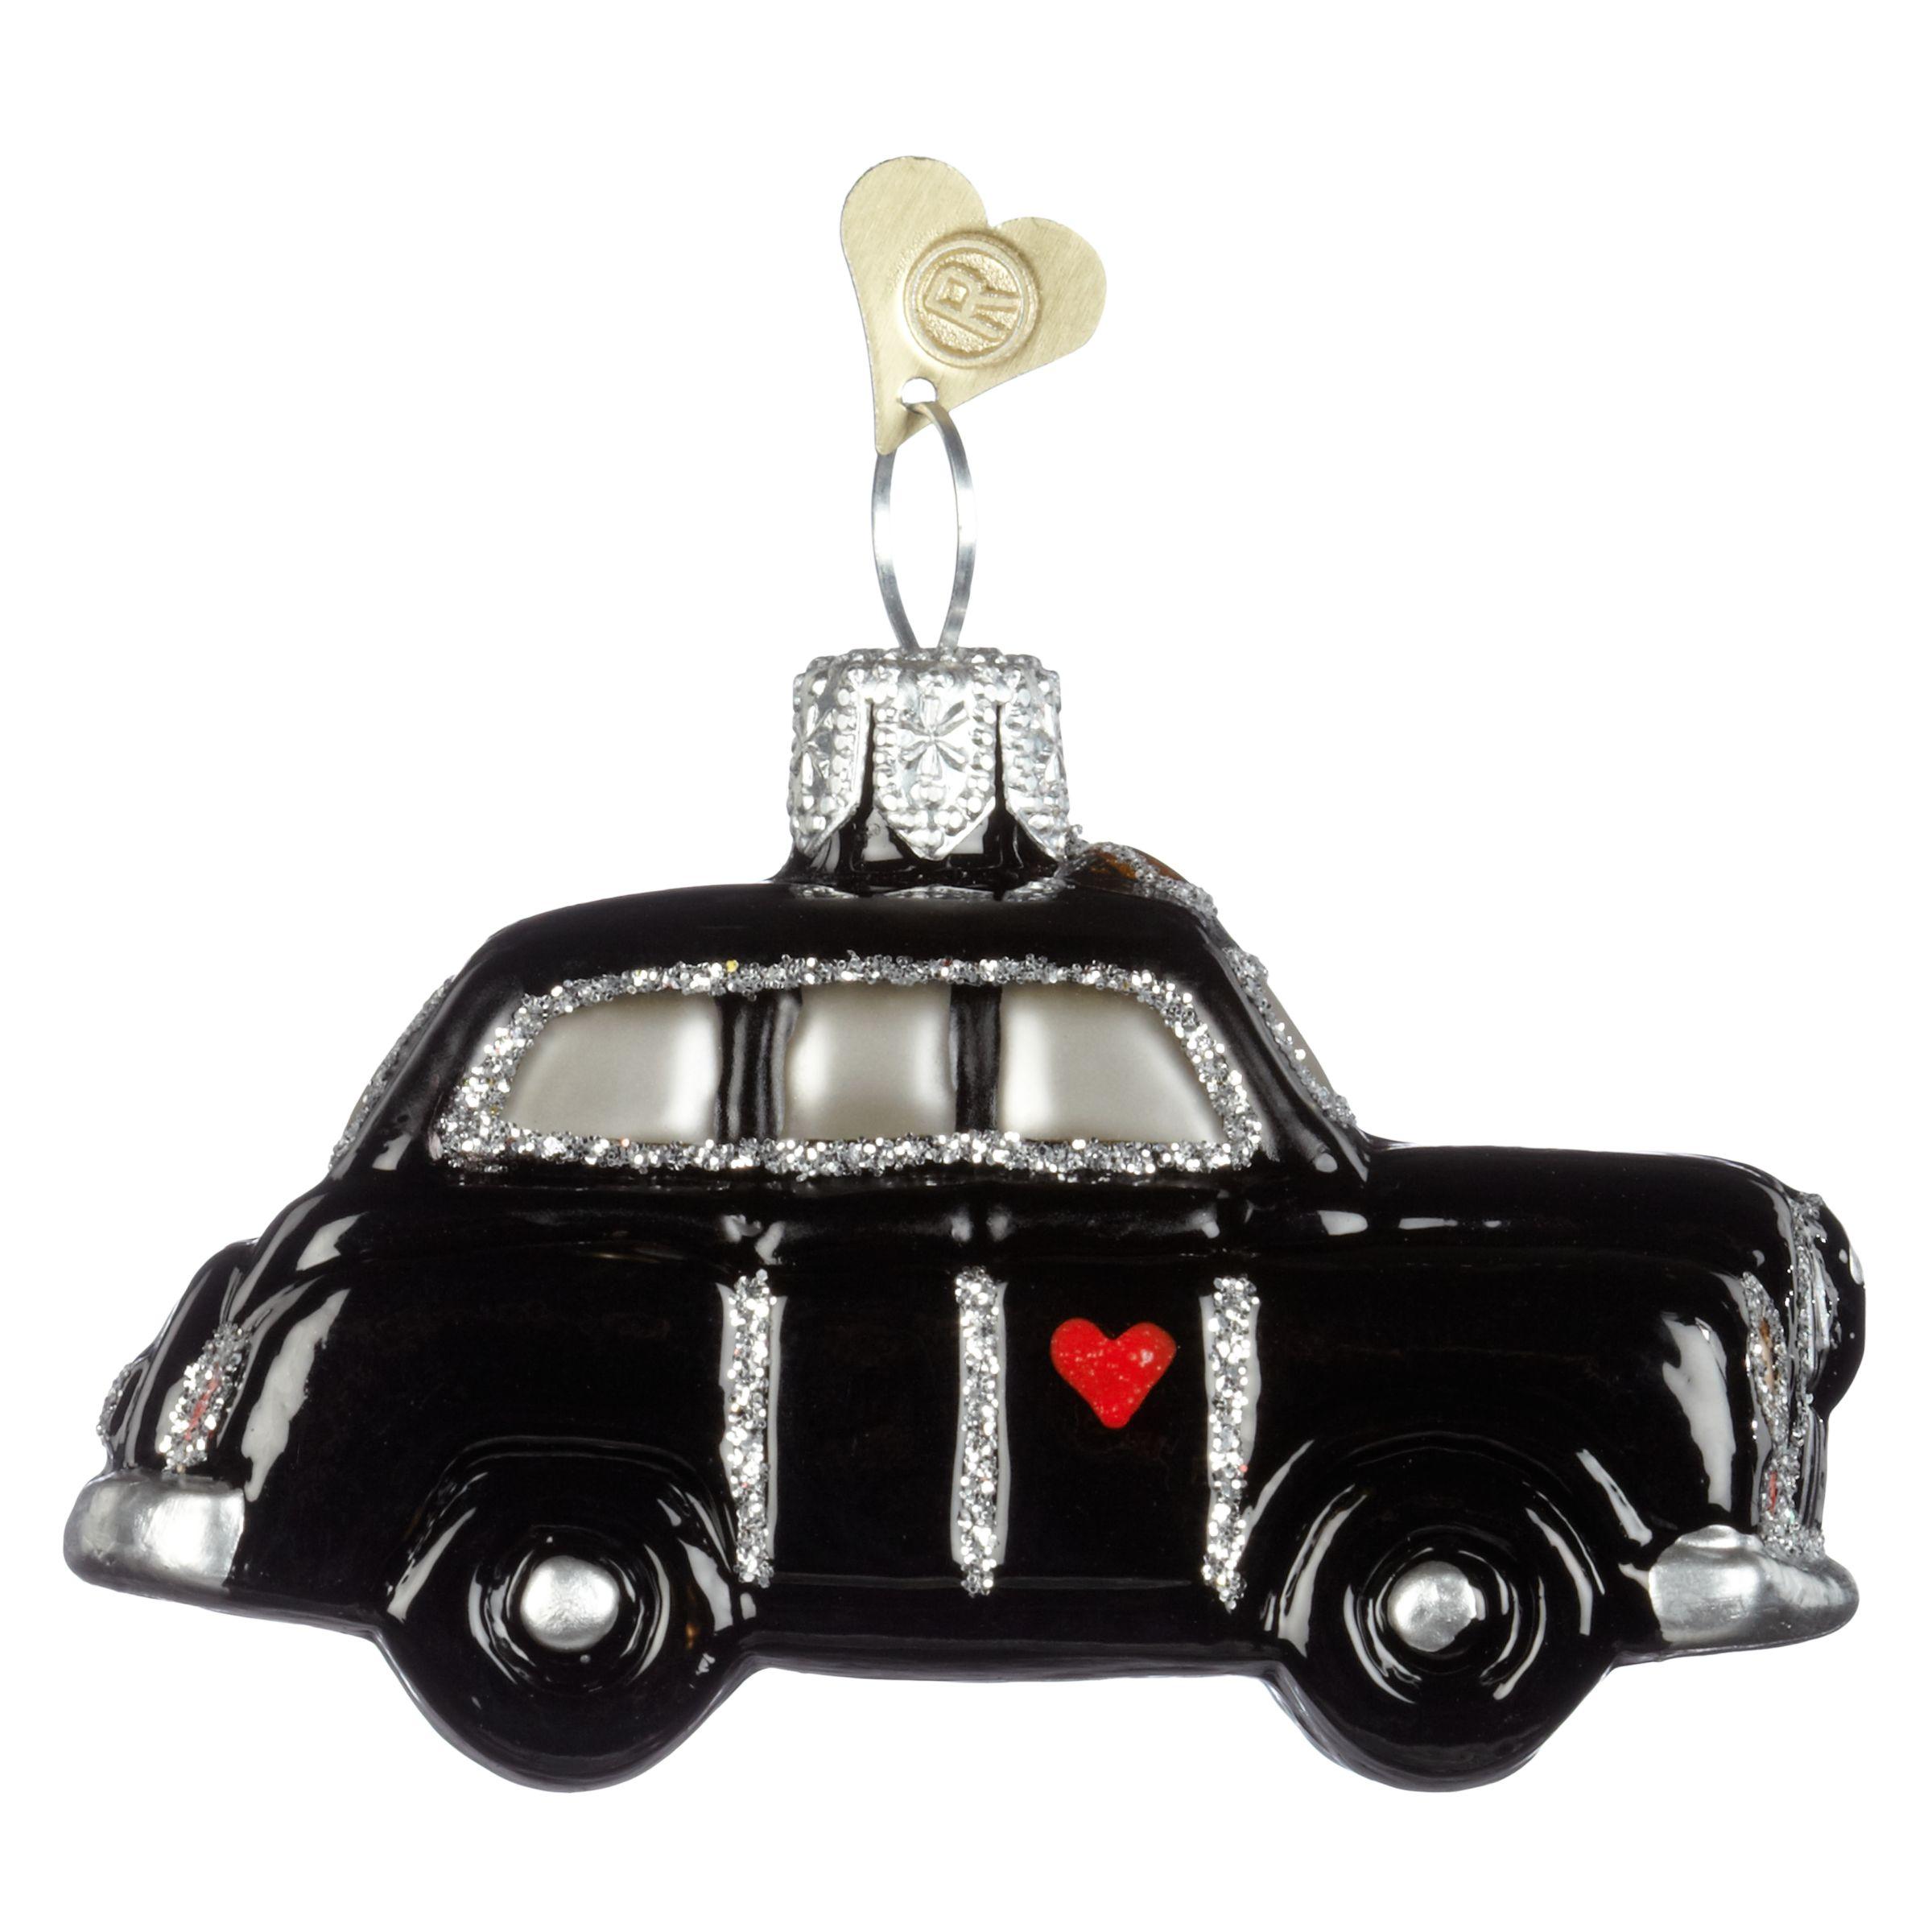 Bombki Bombki Tourism Little London Taxi Glass Hanging Decoration, Black